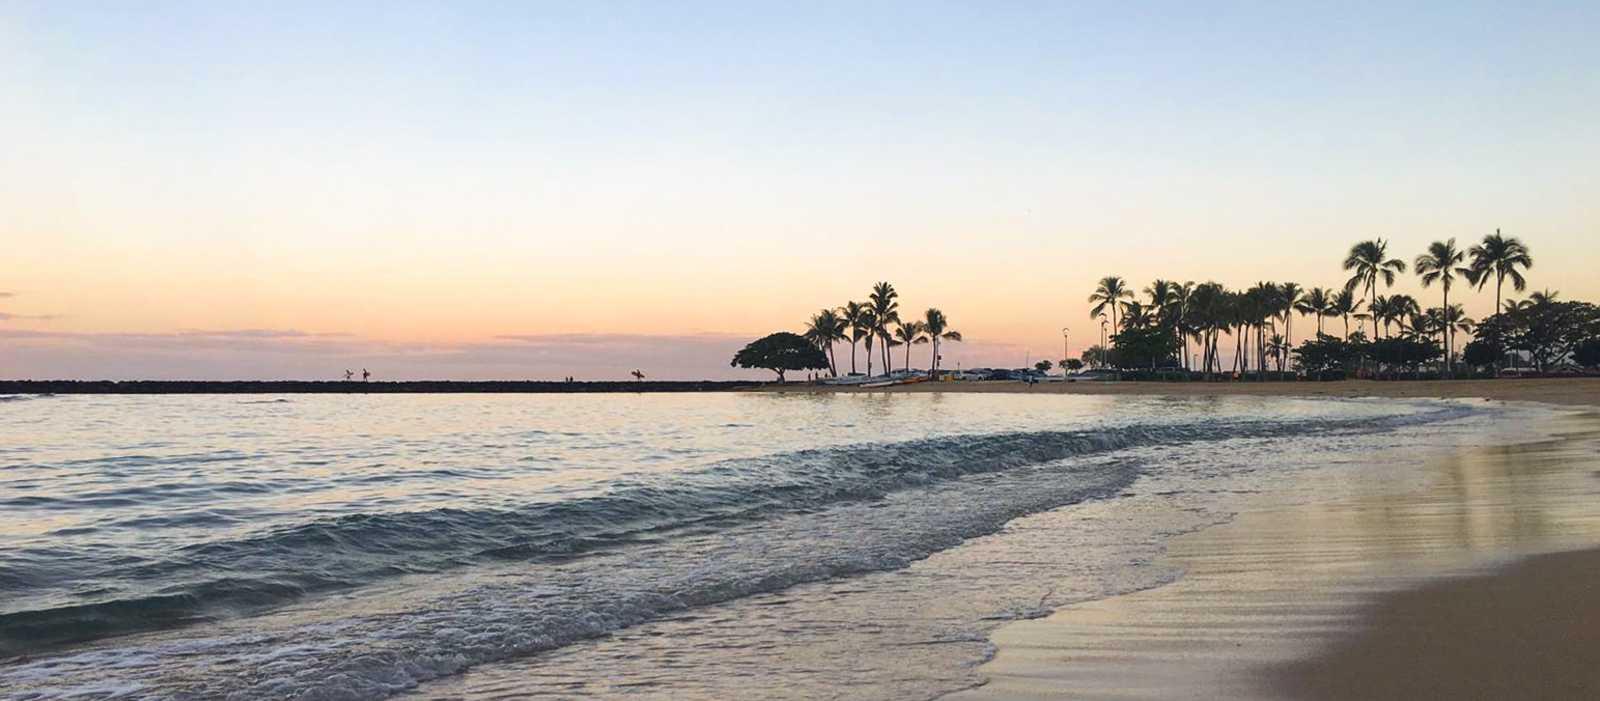 Ein Sonnenuntergang am Waikiki Beach in Oahu